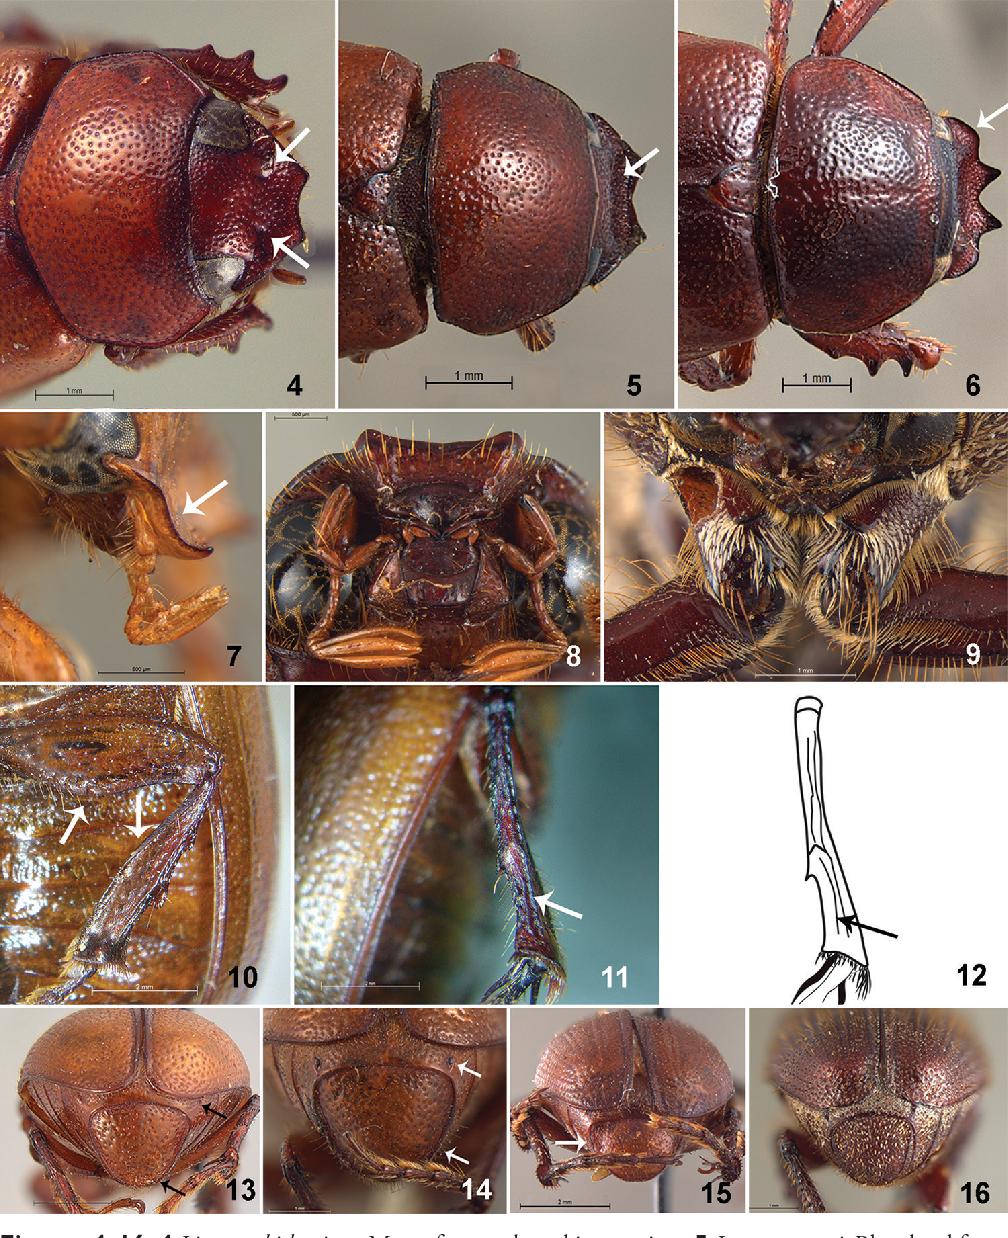 figure 4–16